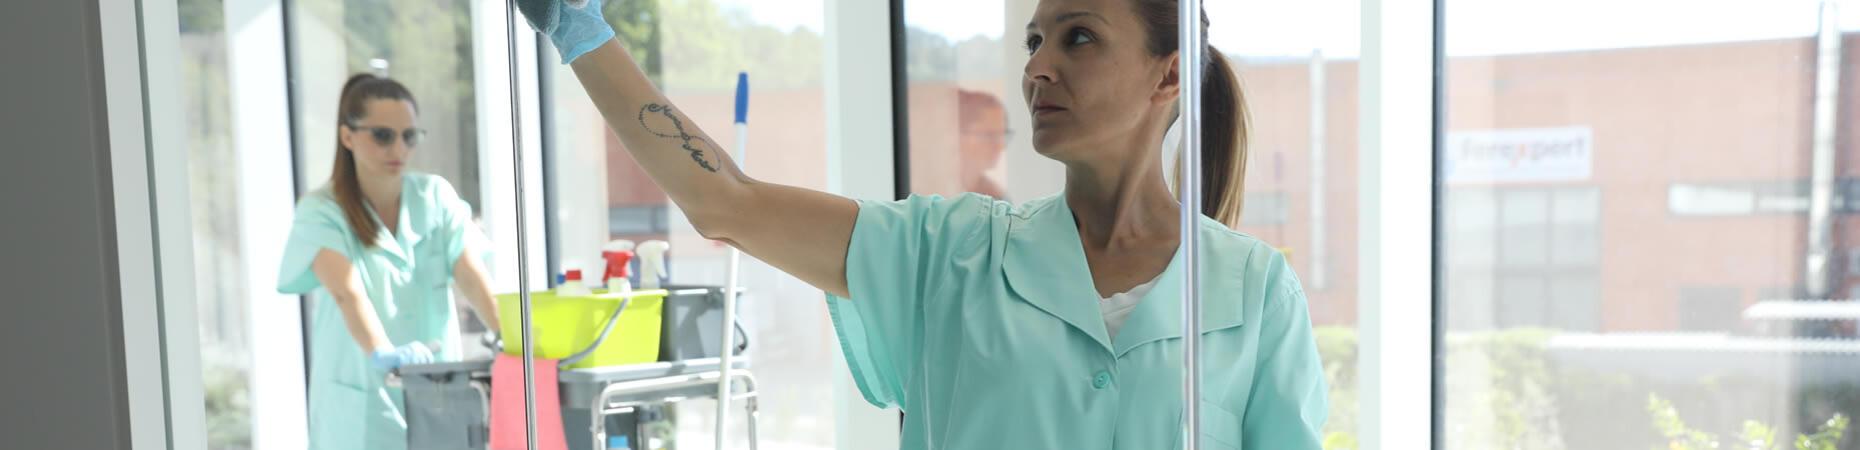 eco-service it pulizie-ospedali-e-strutture-sanitarie 006